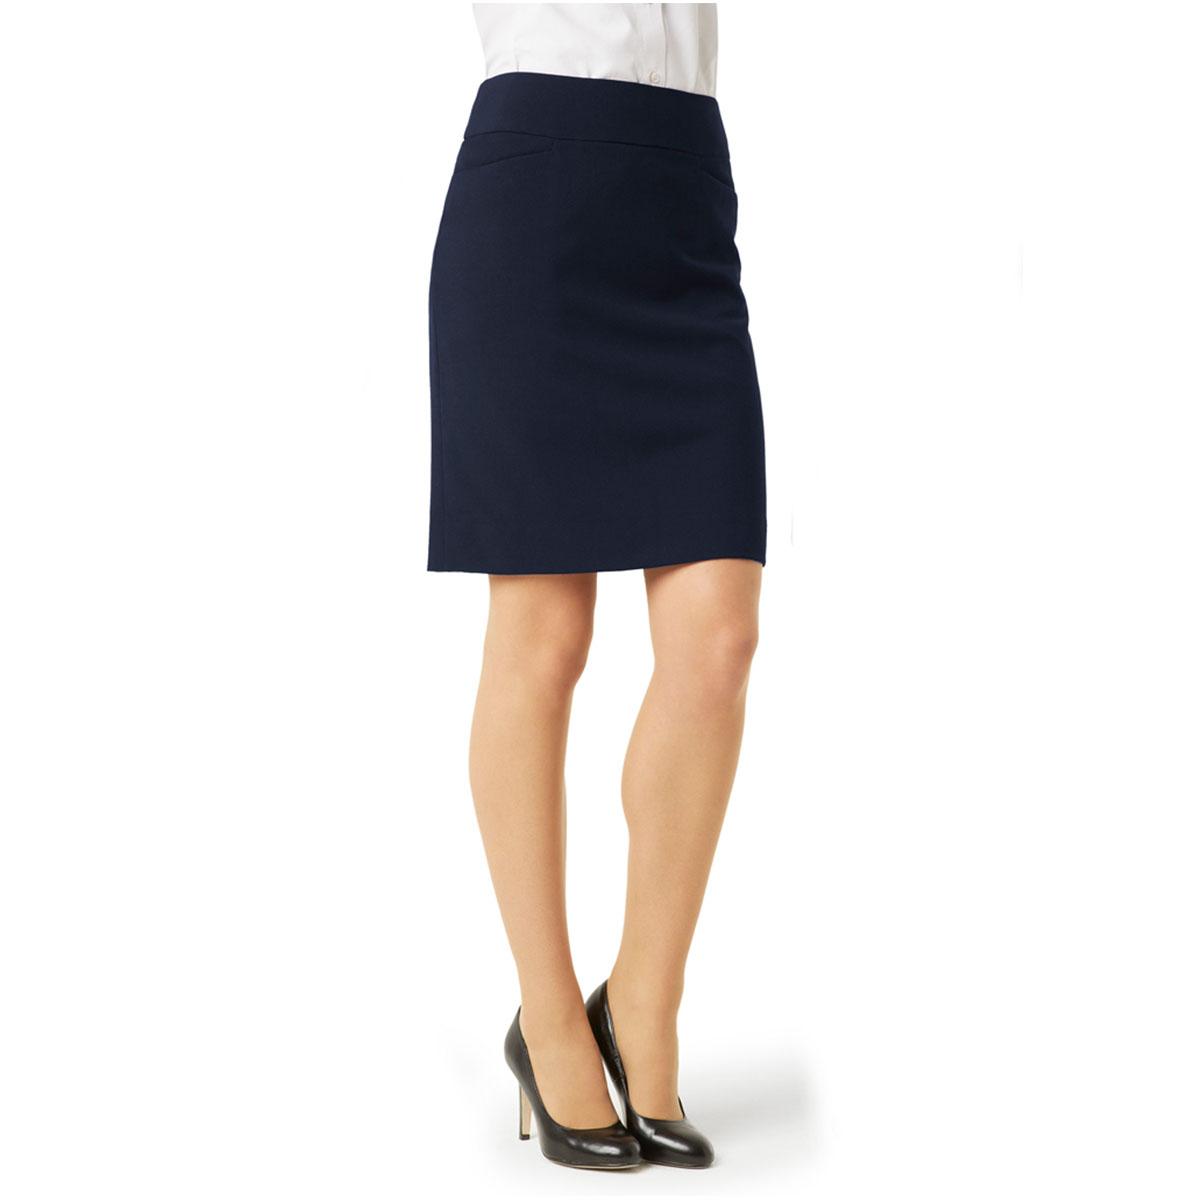 Ladies Classic Knee Length Skirt-Navy